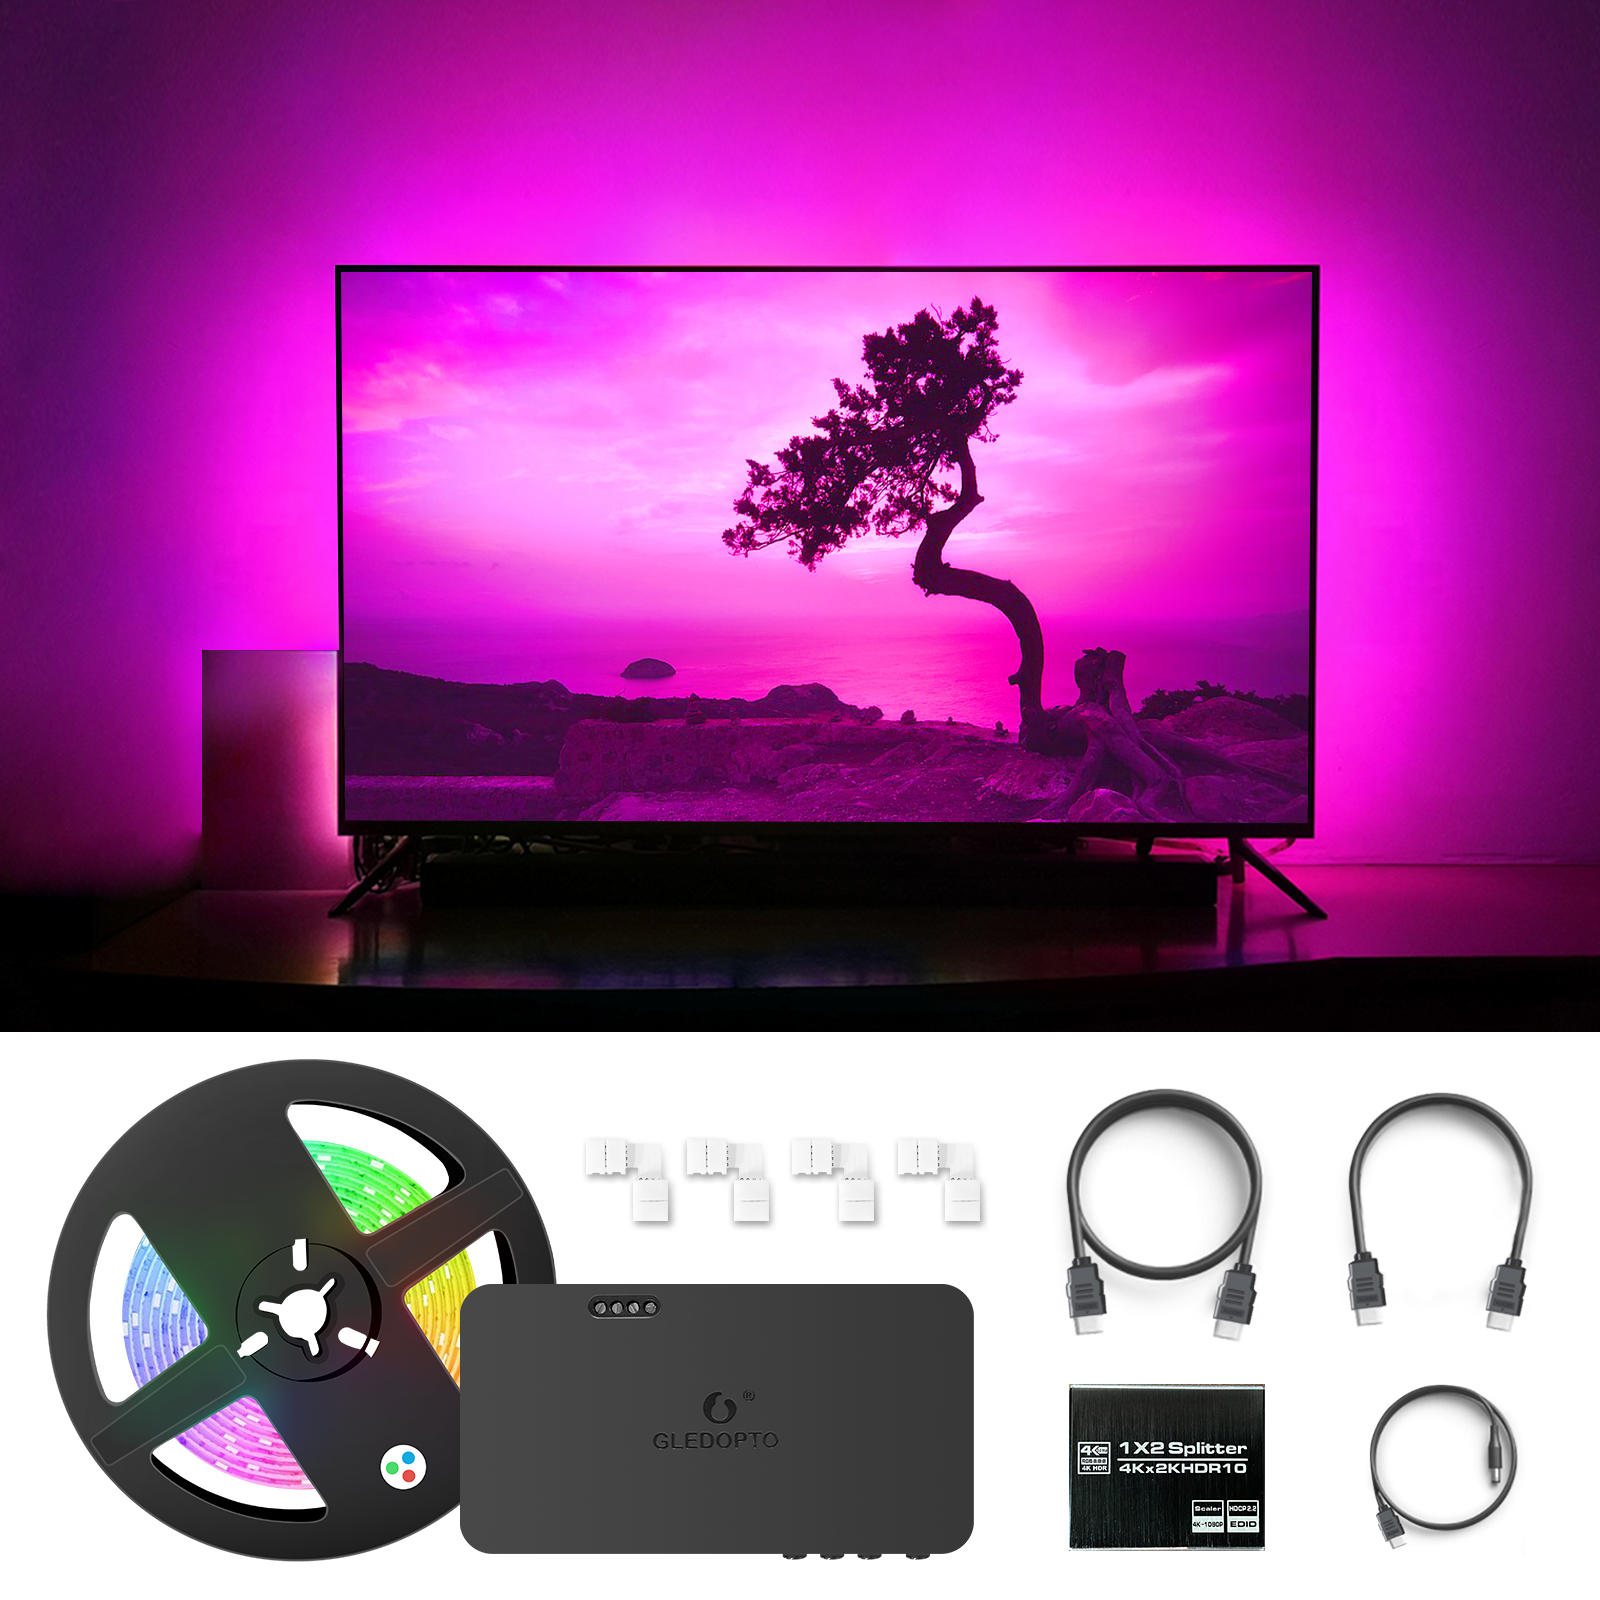 GLEDOPTO Smart TV Background Flex LED Strip Light HDMI compatible SYNC Box  Kit Color Change HDMI compatible Splitter Adapter RGB Controlers